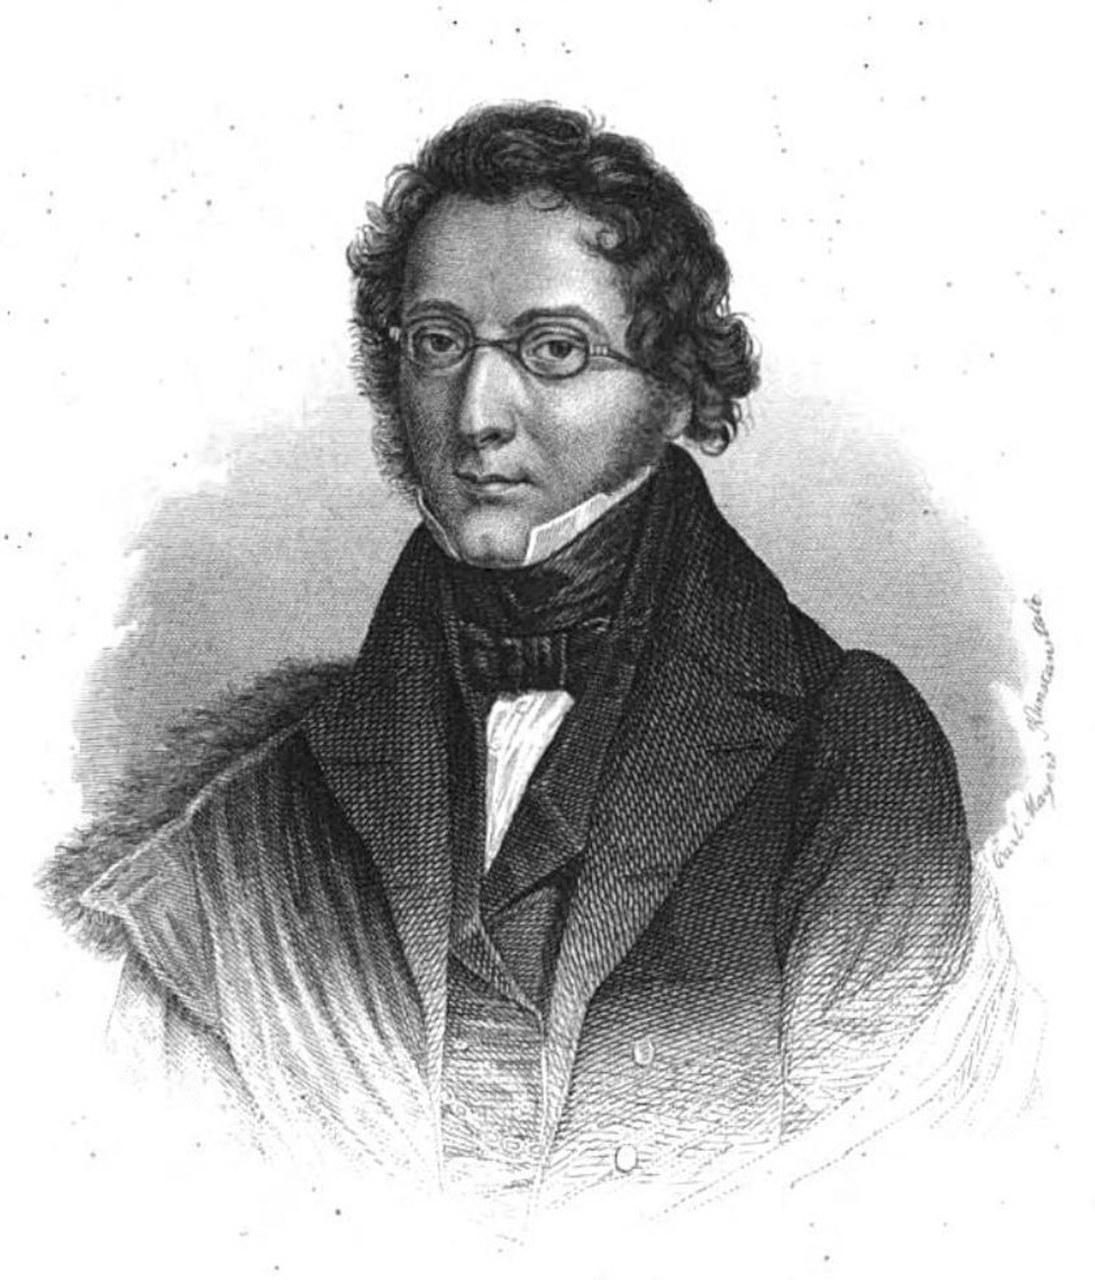 Fig. 4 Ludwig Bechstein, Incisione xilografica. In: Deutscher Musenalmanach, Nürnberg 1852 (Wikimedia Commons). Il suo Märchenbuch (1845) contiene la variante Das Märchen vom Ritter Blaubart.